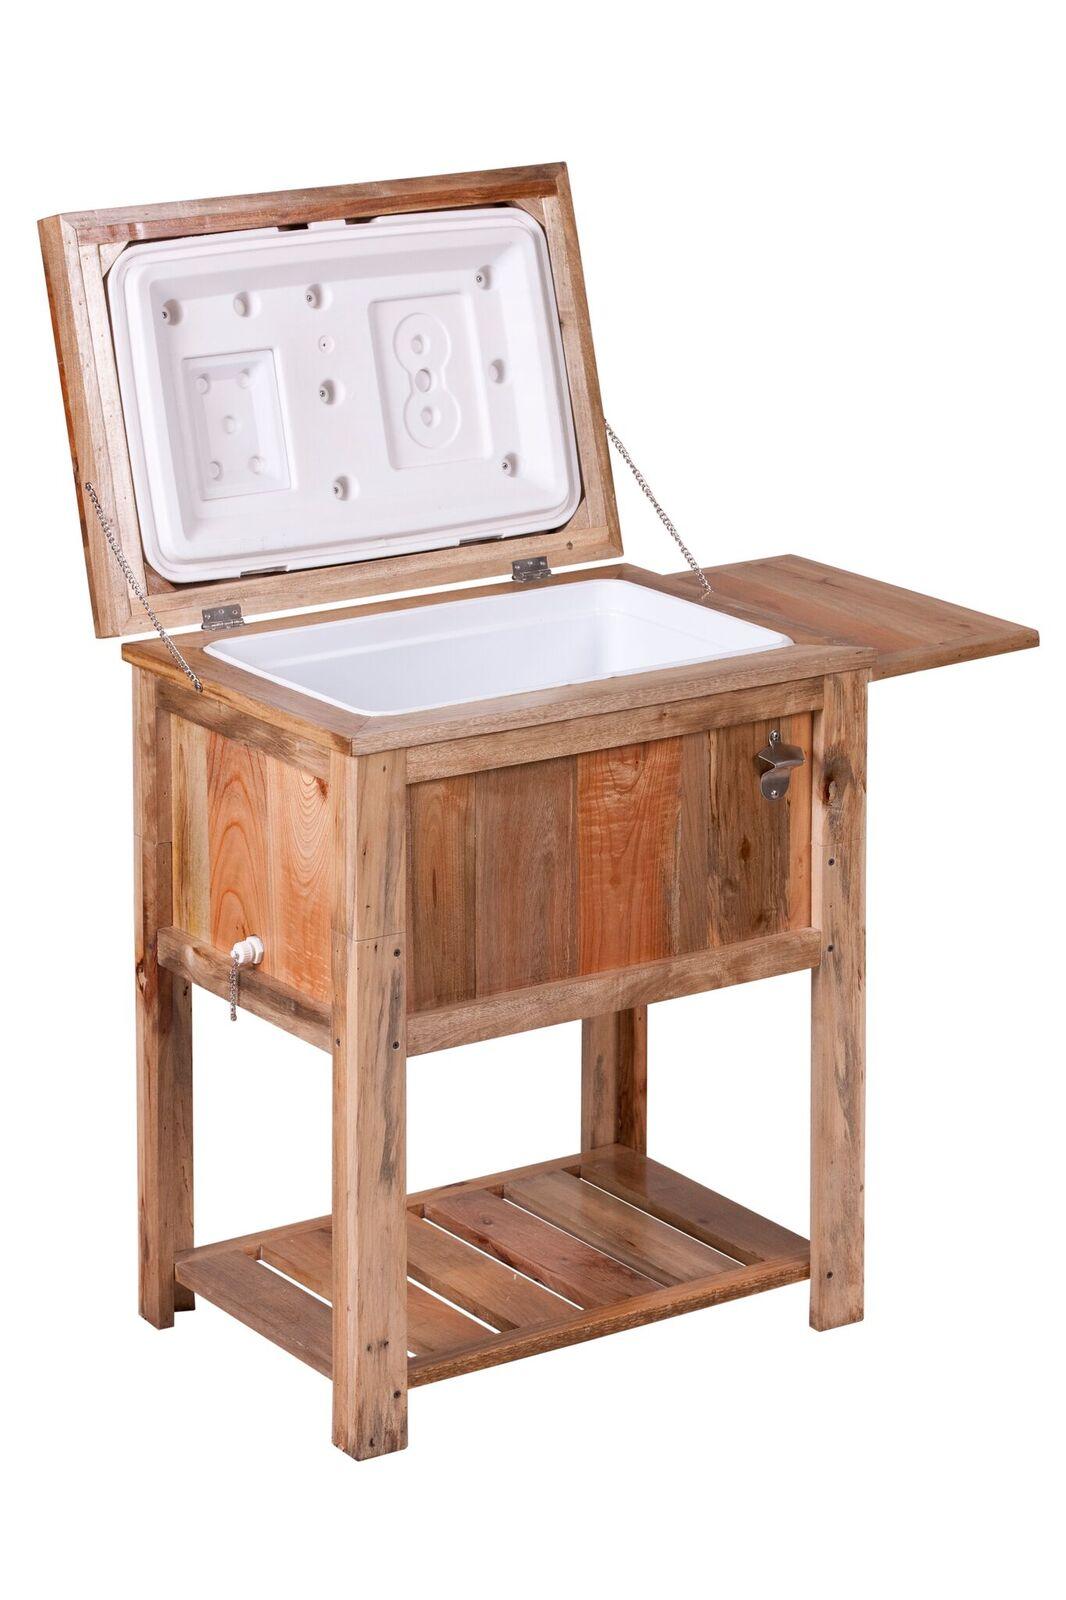 50 litre Monolith cool box